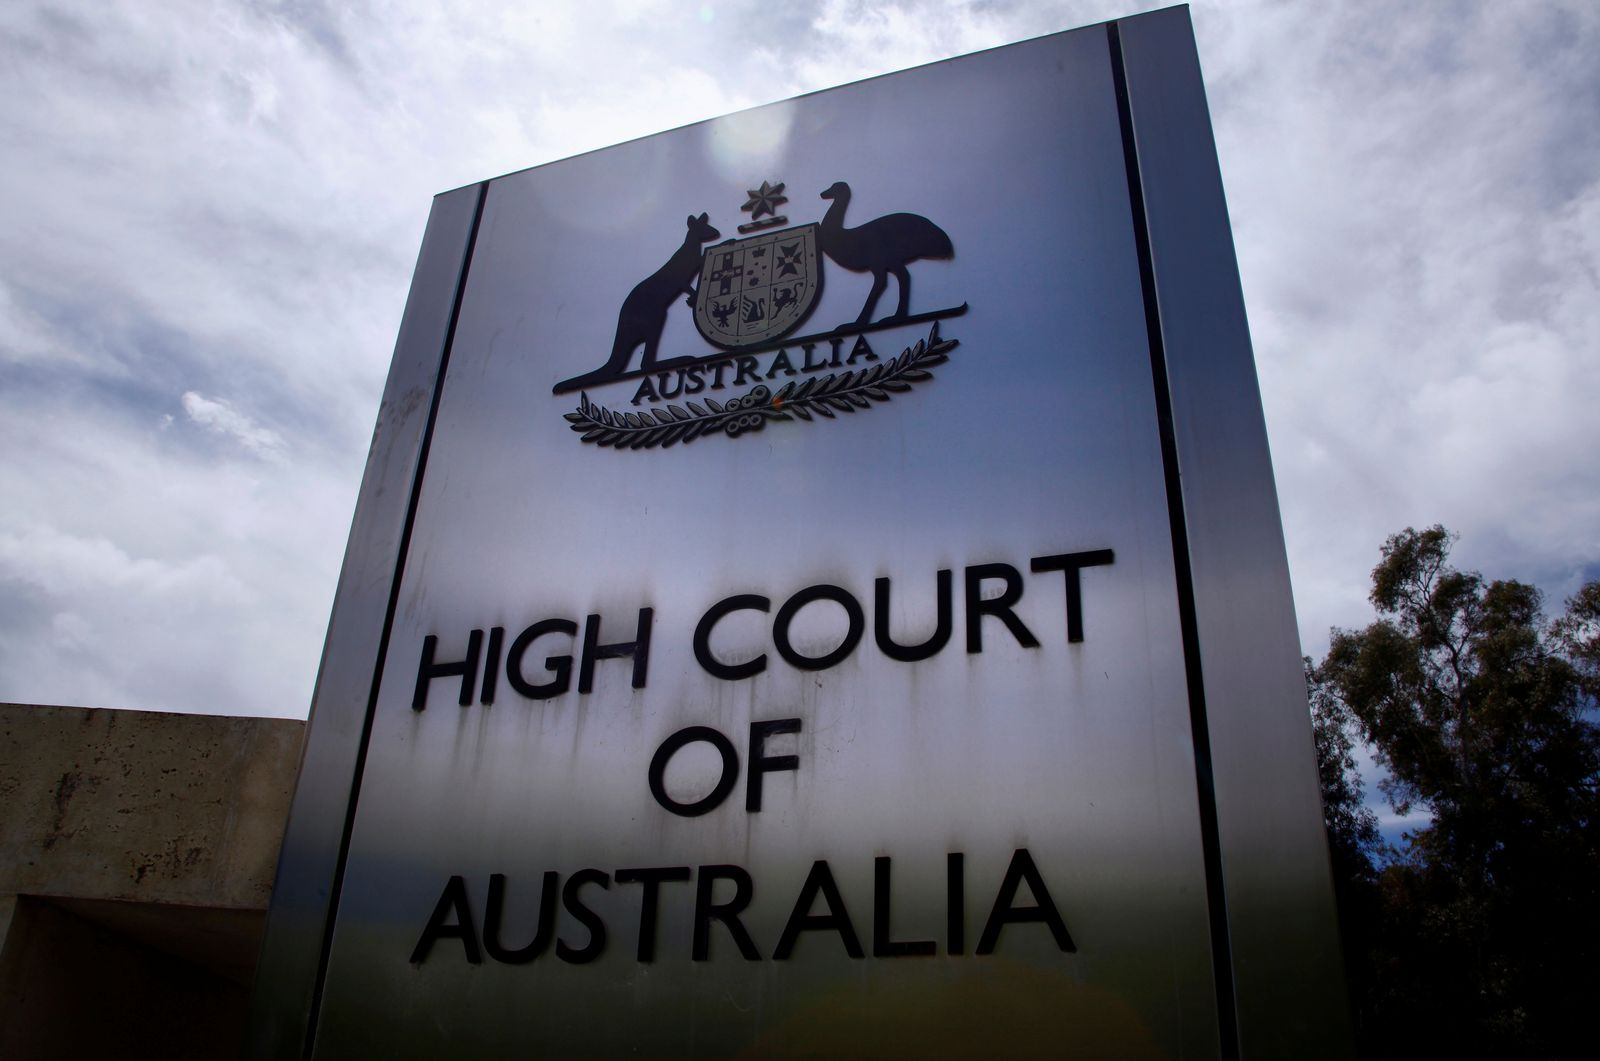 High Court of Australia/ Canberra